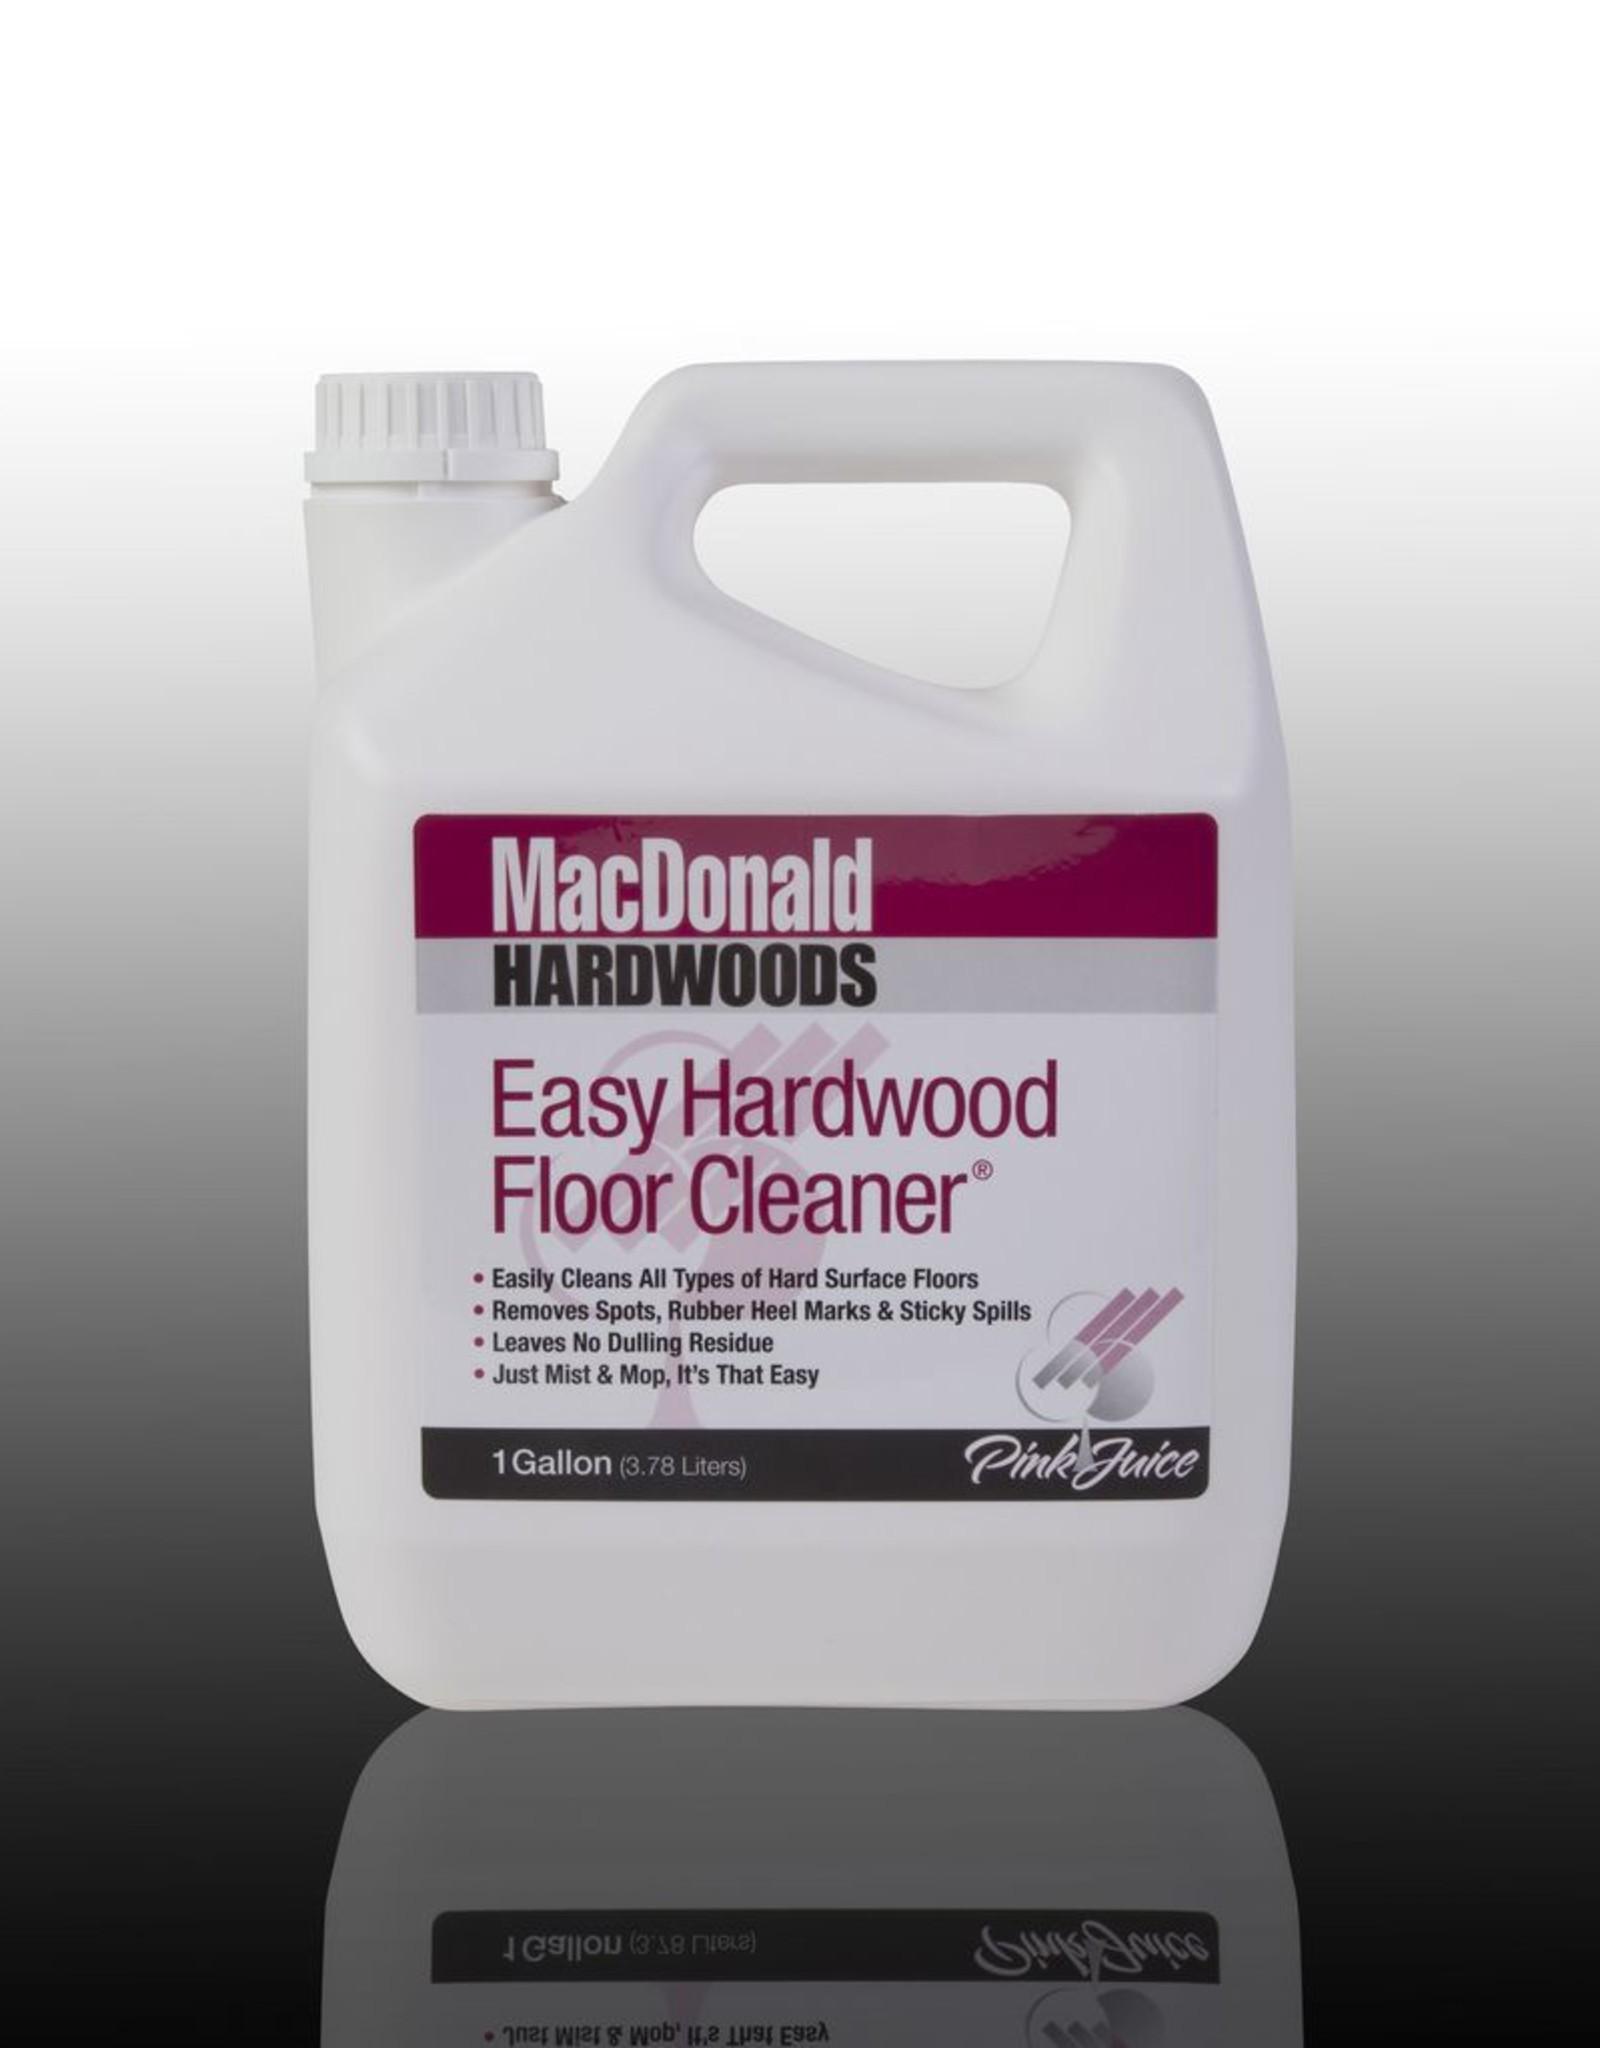 MacDonald MacDonald Easy Hardwood Floor Cleaner, One Gallon